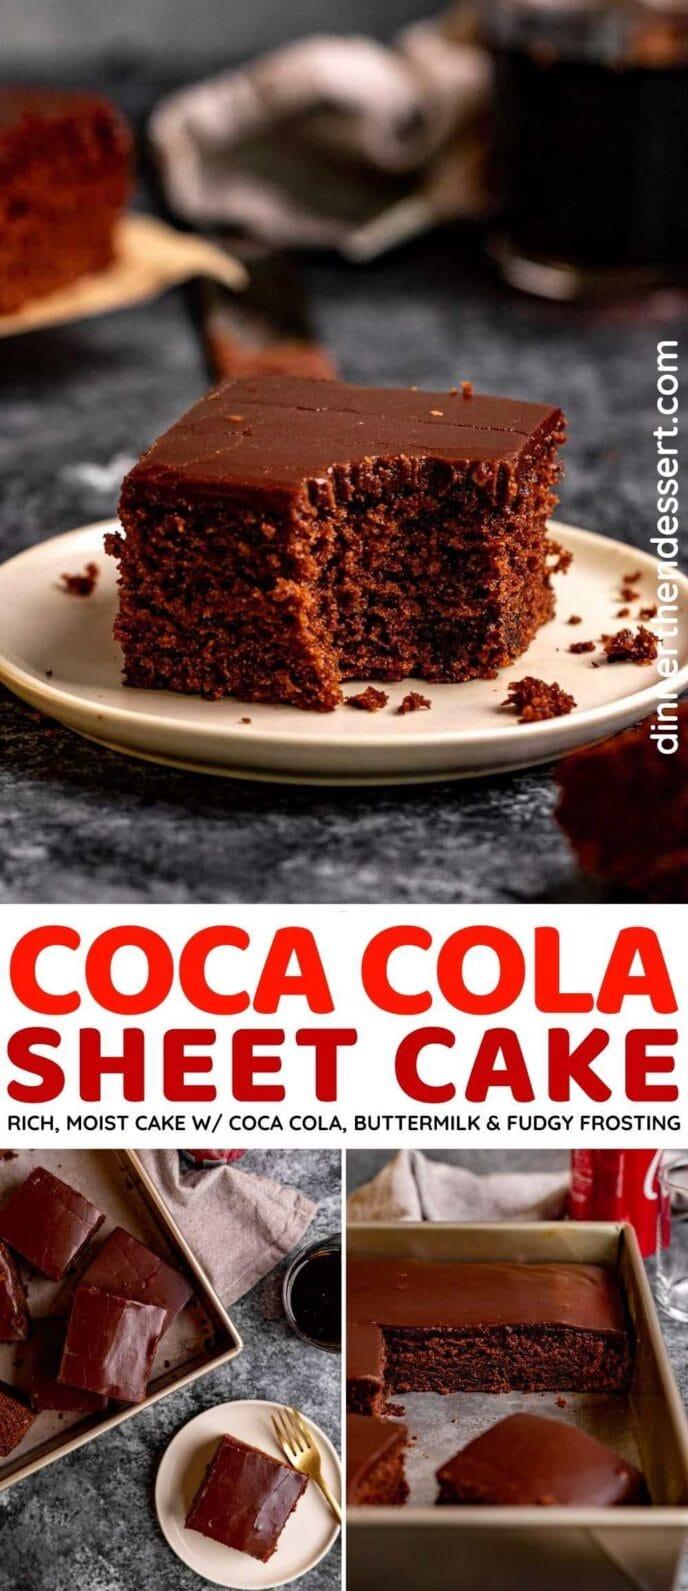 Coca Cola Sheet Cake collage